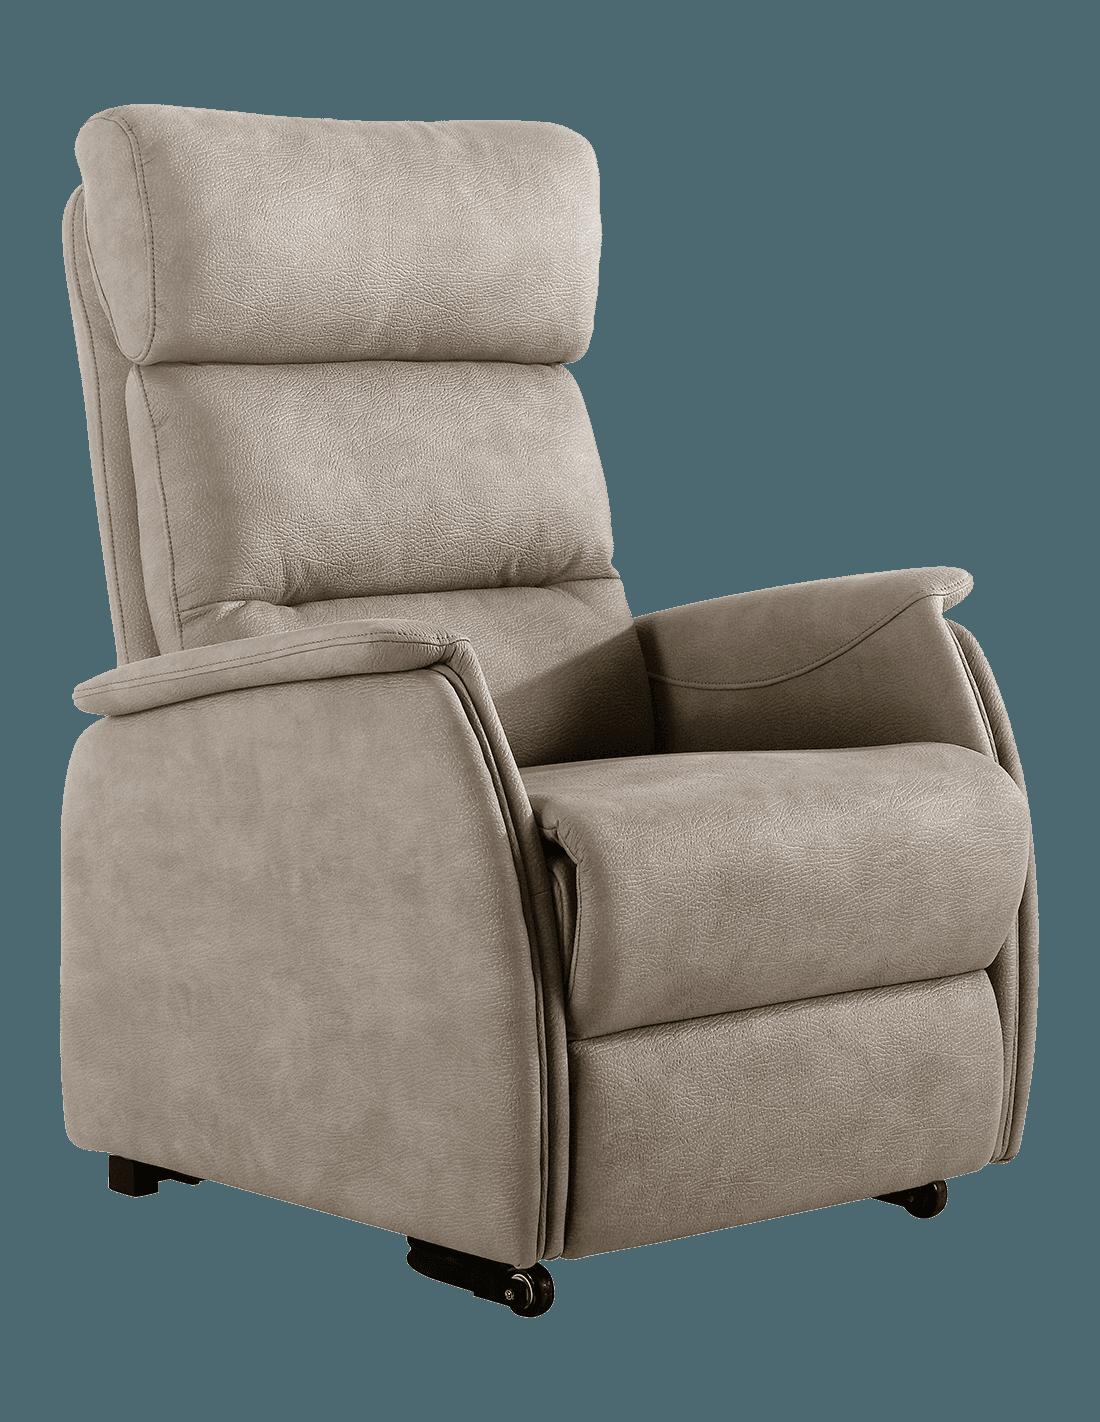 fauteuil releveur brescia 2 moteurs. Black Bedroom Furniture Sets. Home Design Ideas